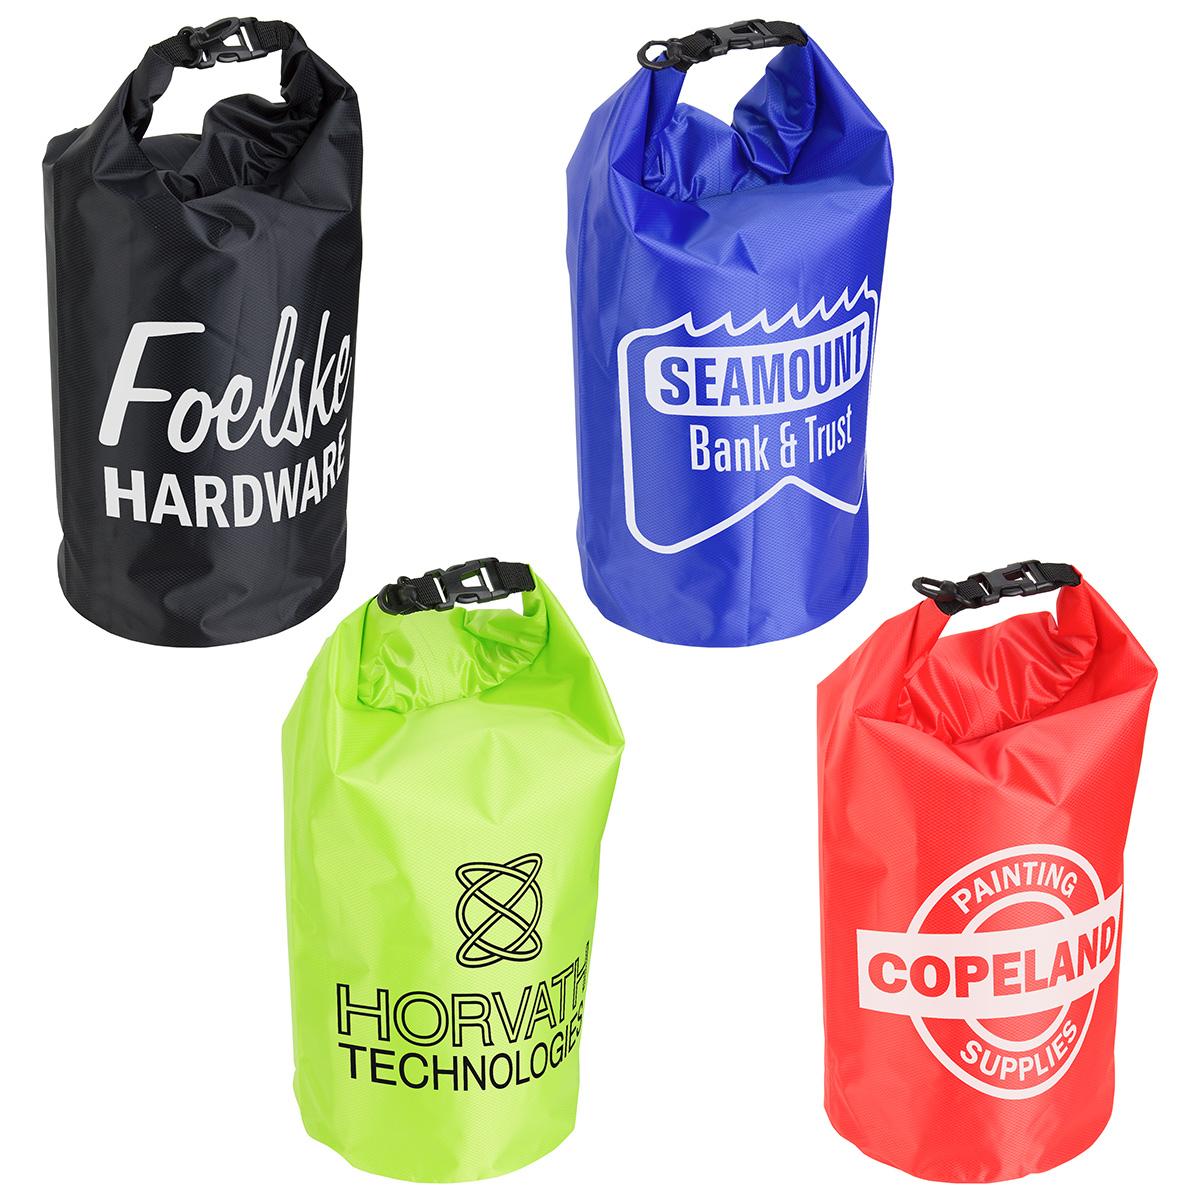 10 Liter Waterproof Gear Bag, WBA-WG18, 1 Colour Imprint